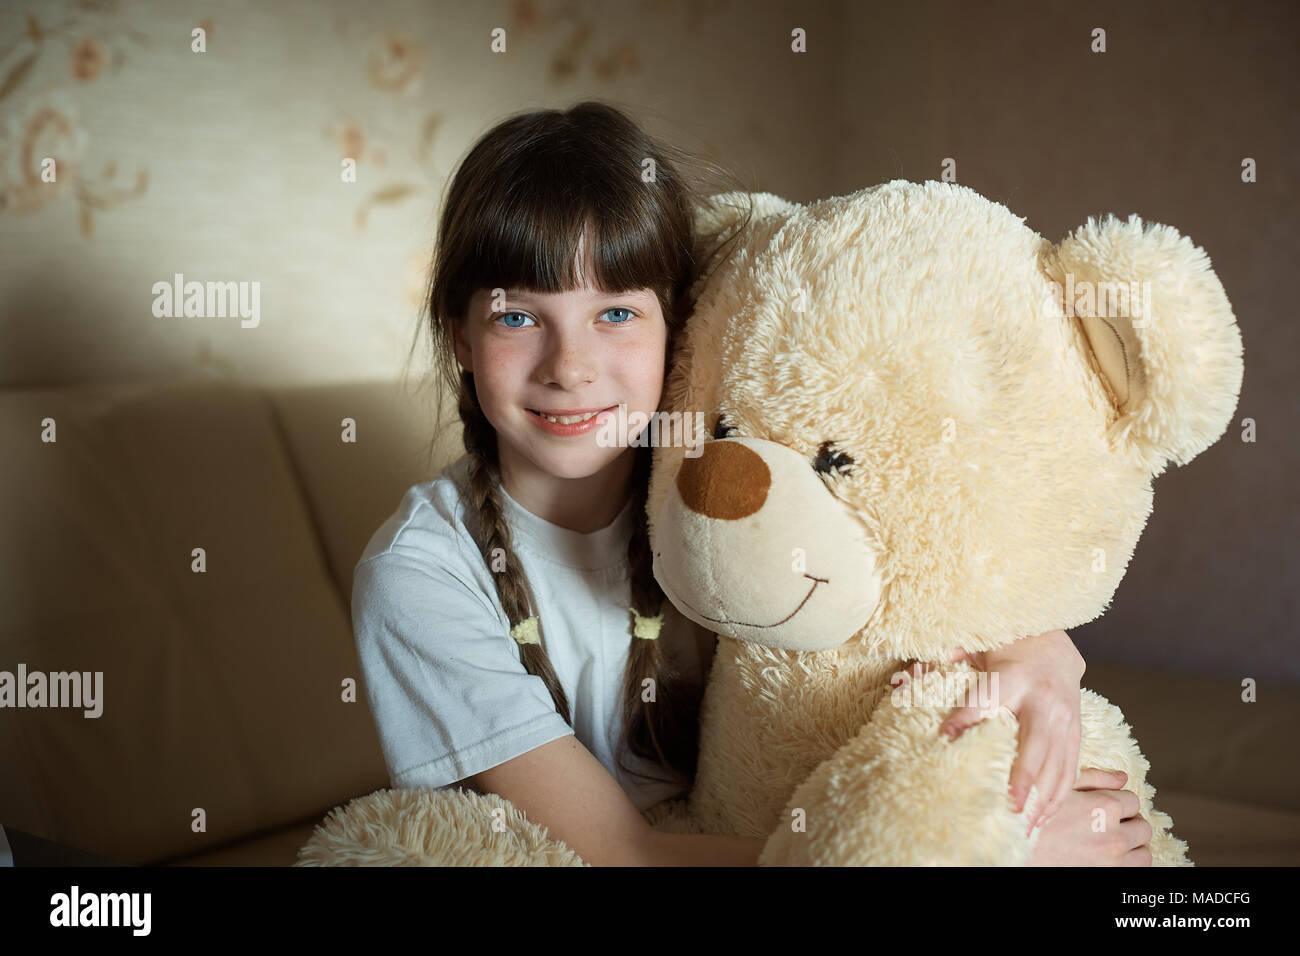 little girl hugging teddy bear indoor in her room, devotion concept, big bear toy - Stock Image